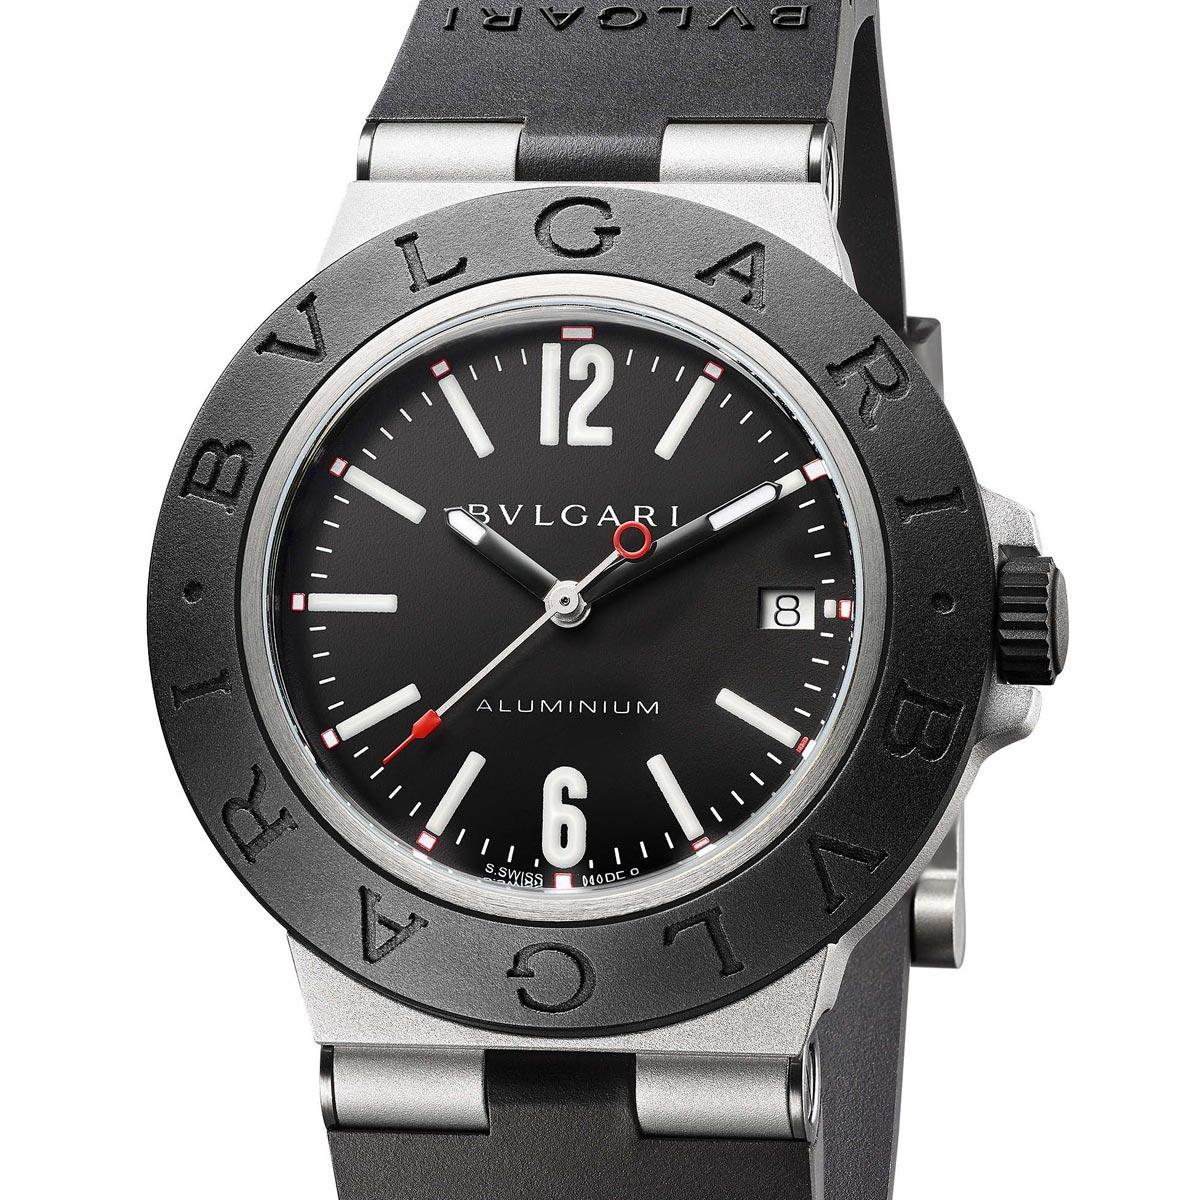 La Cote des Montres : Photo - Bvlgari Aluminium Watch